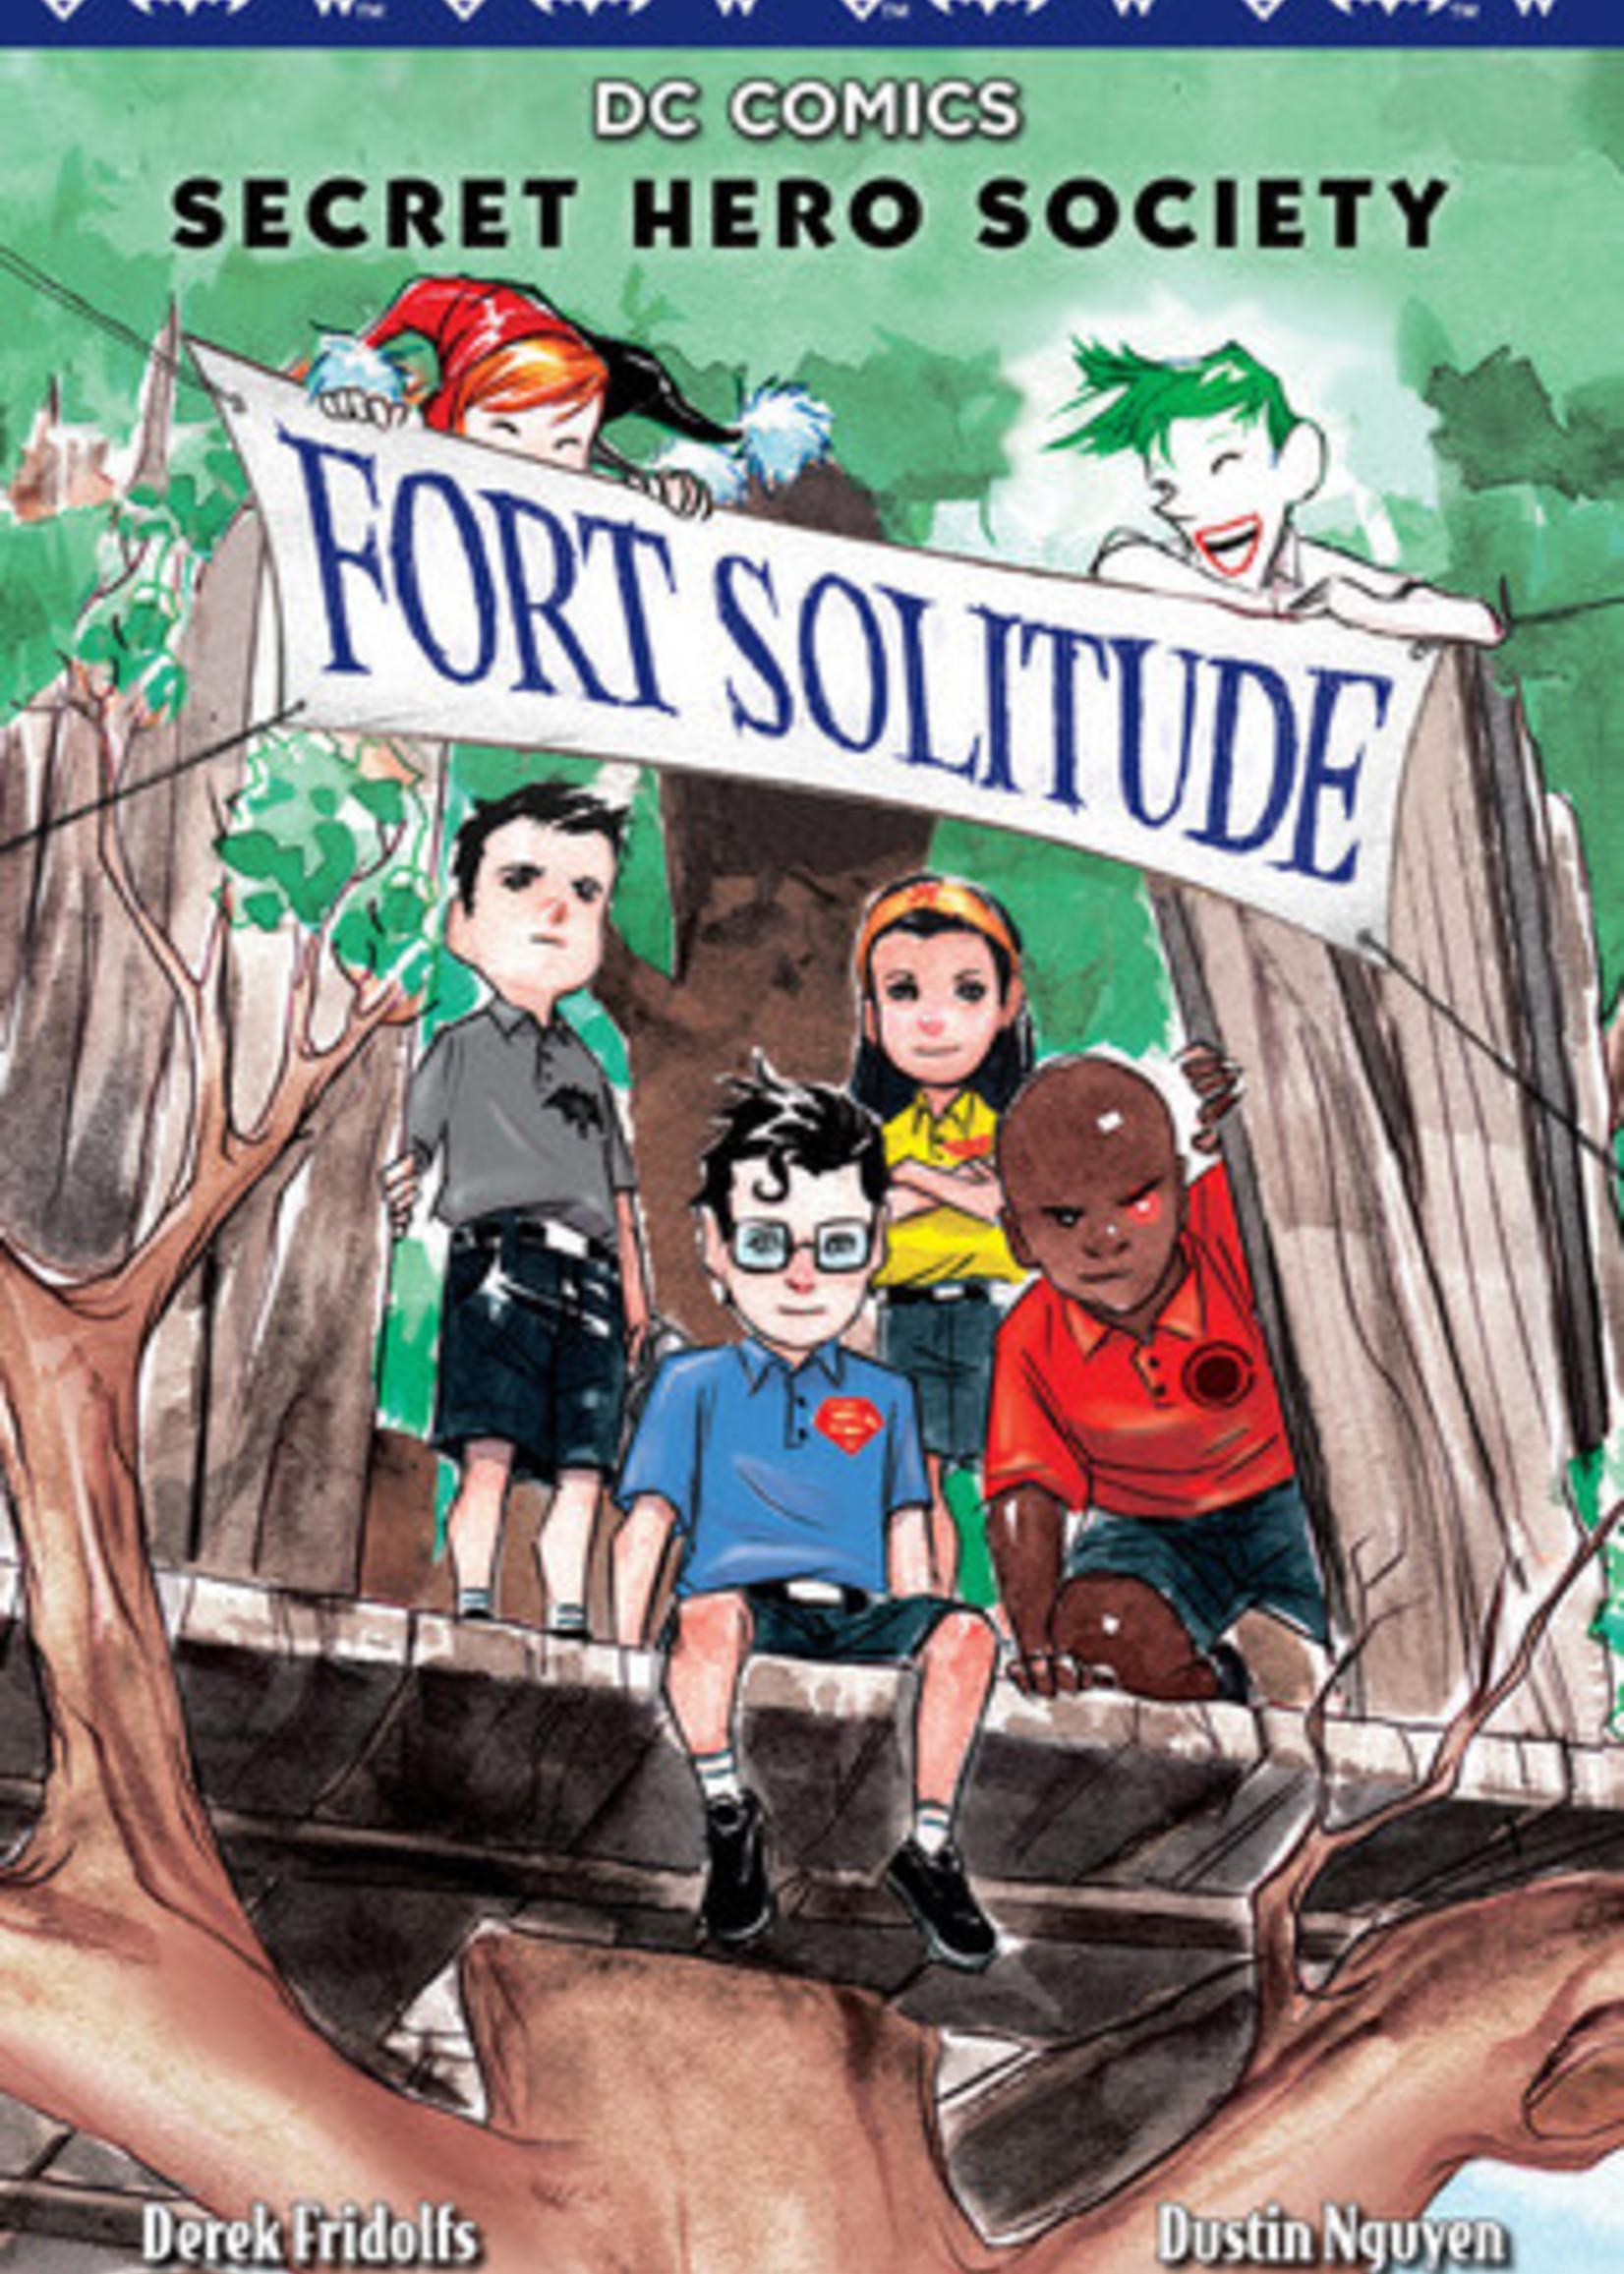 Fort Solitude (DC Comics: Secret Hero Society #2) by Derek Fridolfs,  Dustin Nguyen